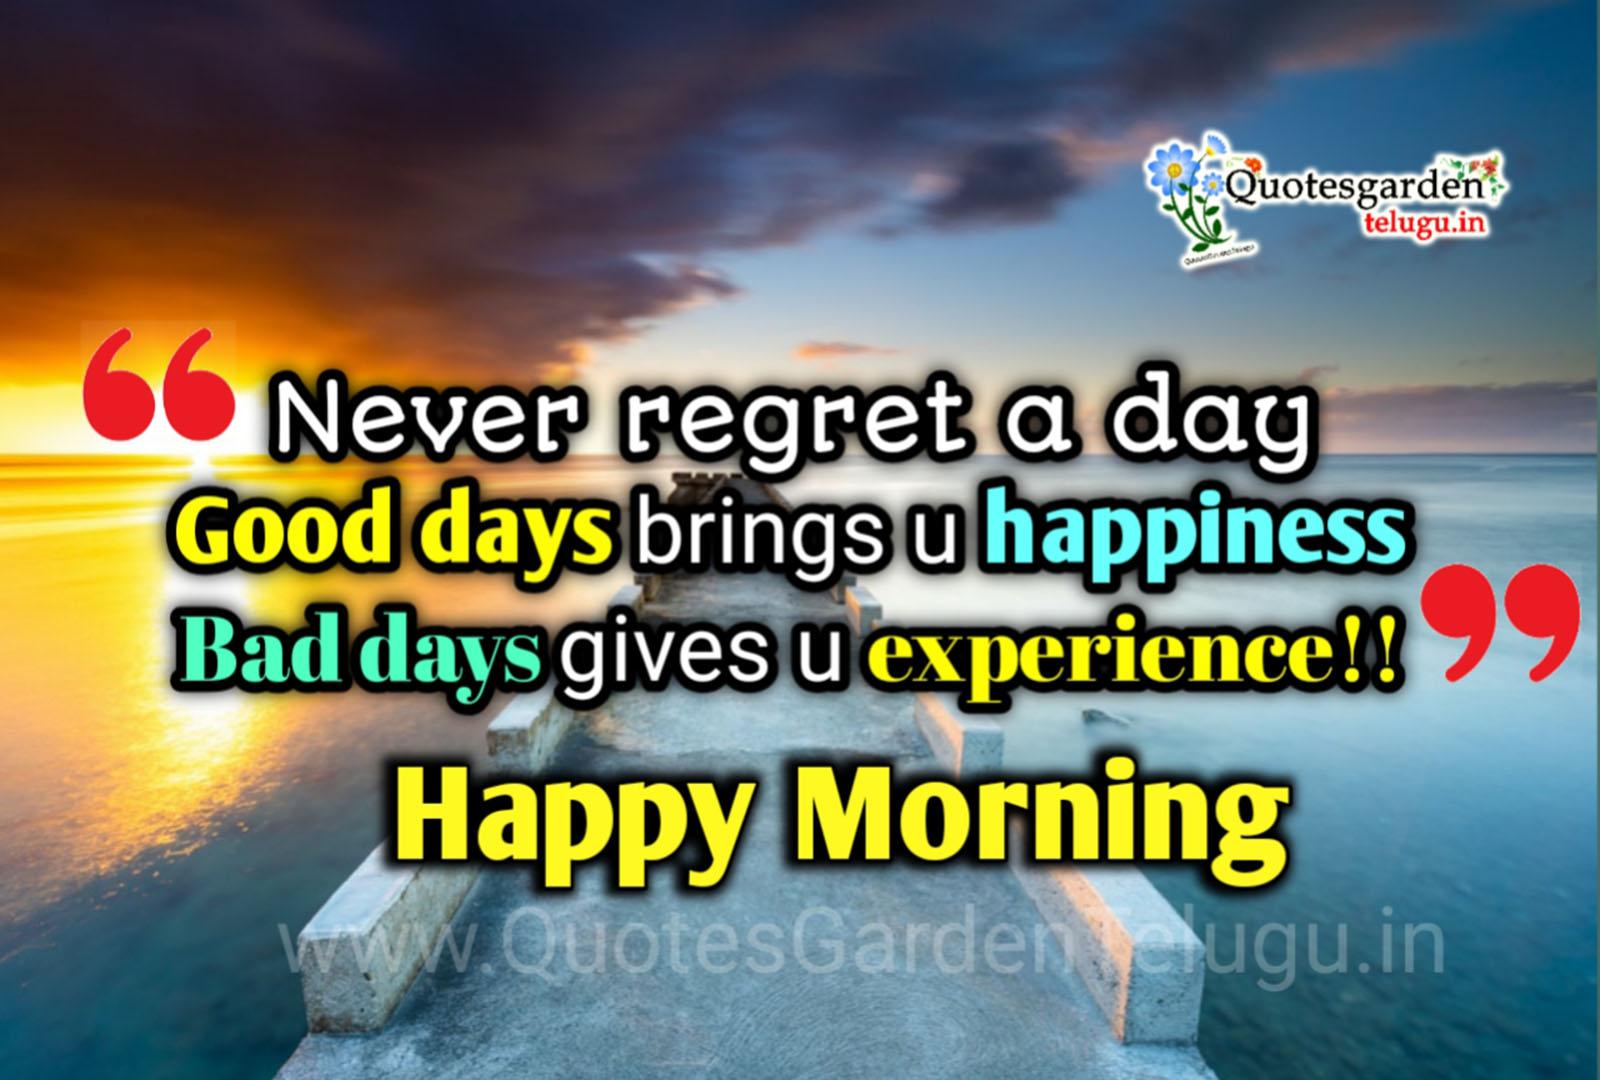 Good Morning Inspirational Quotes Quotes Garden Telugu Telugu Quotes English Quotes Hindi Quotes